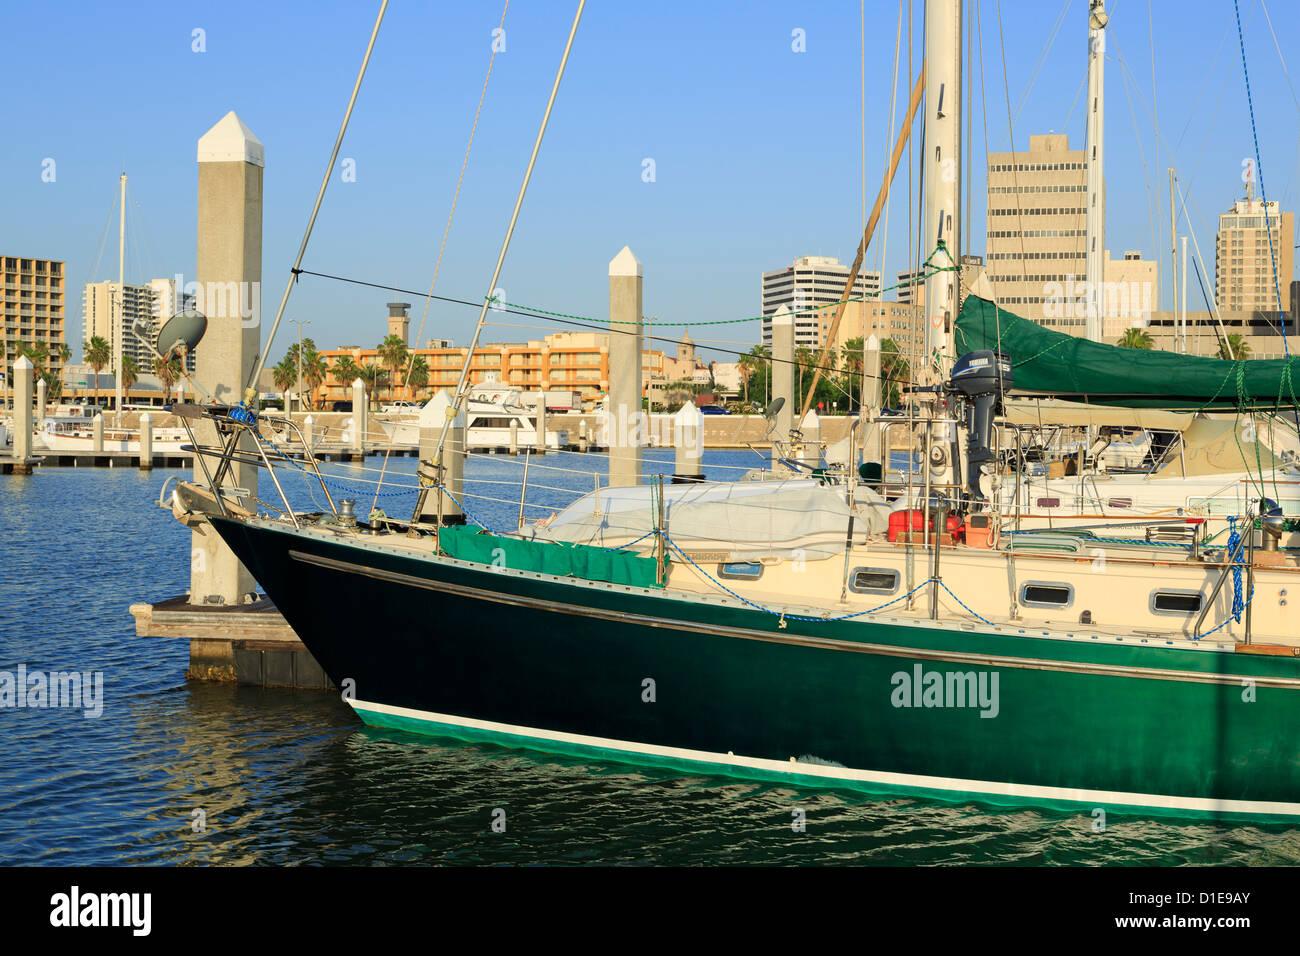 Boat marina in Corpus Christi, Texas, United States of America, North America - Stock Image